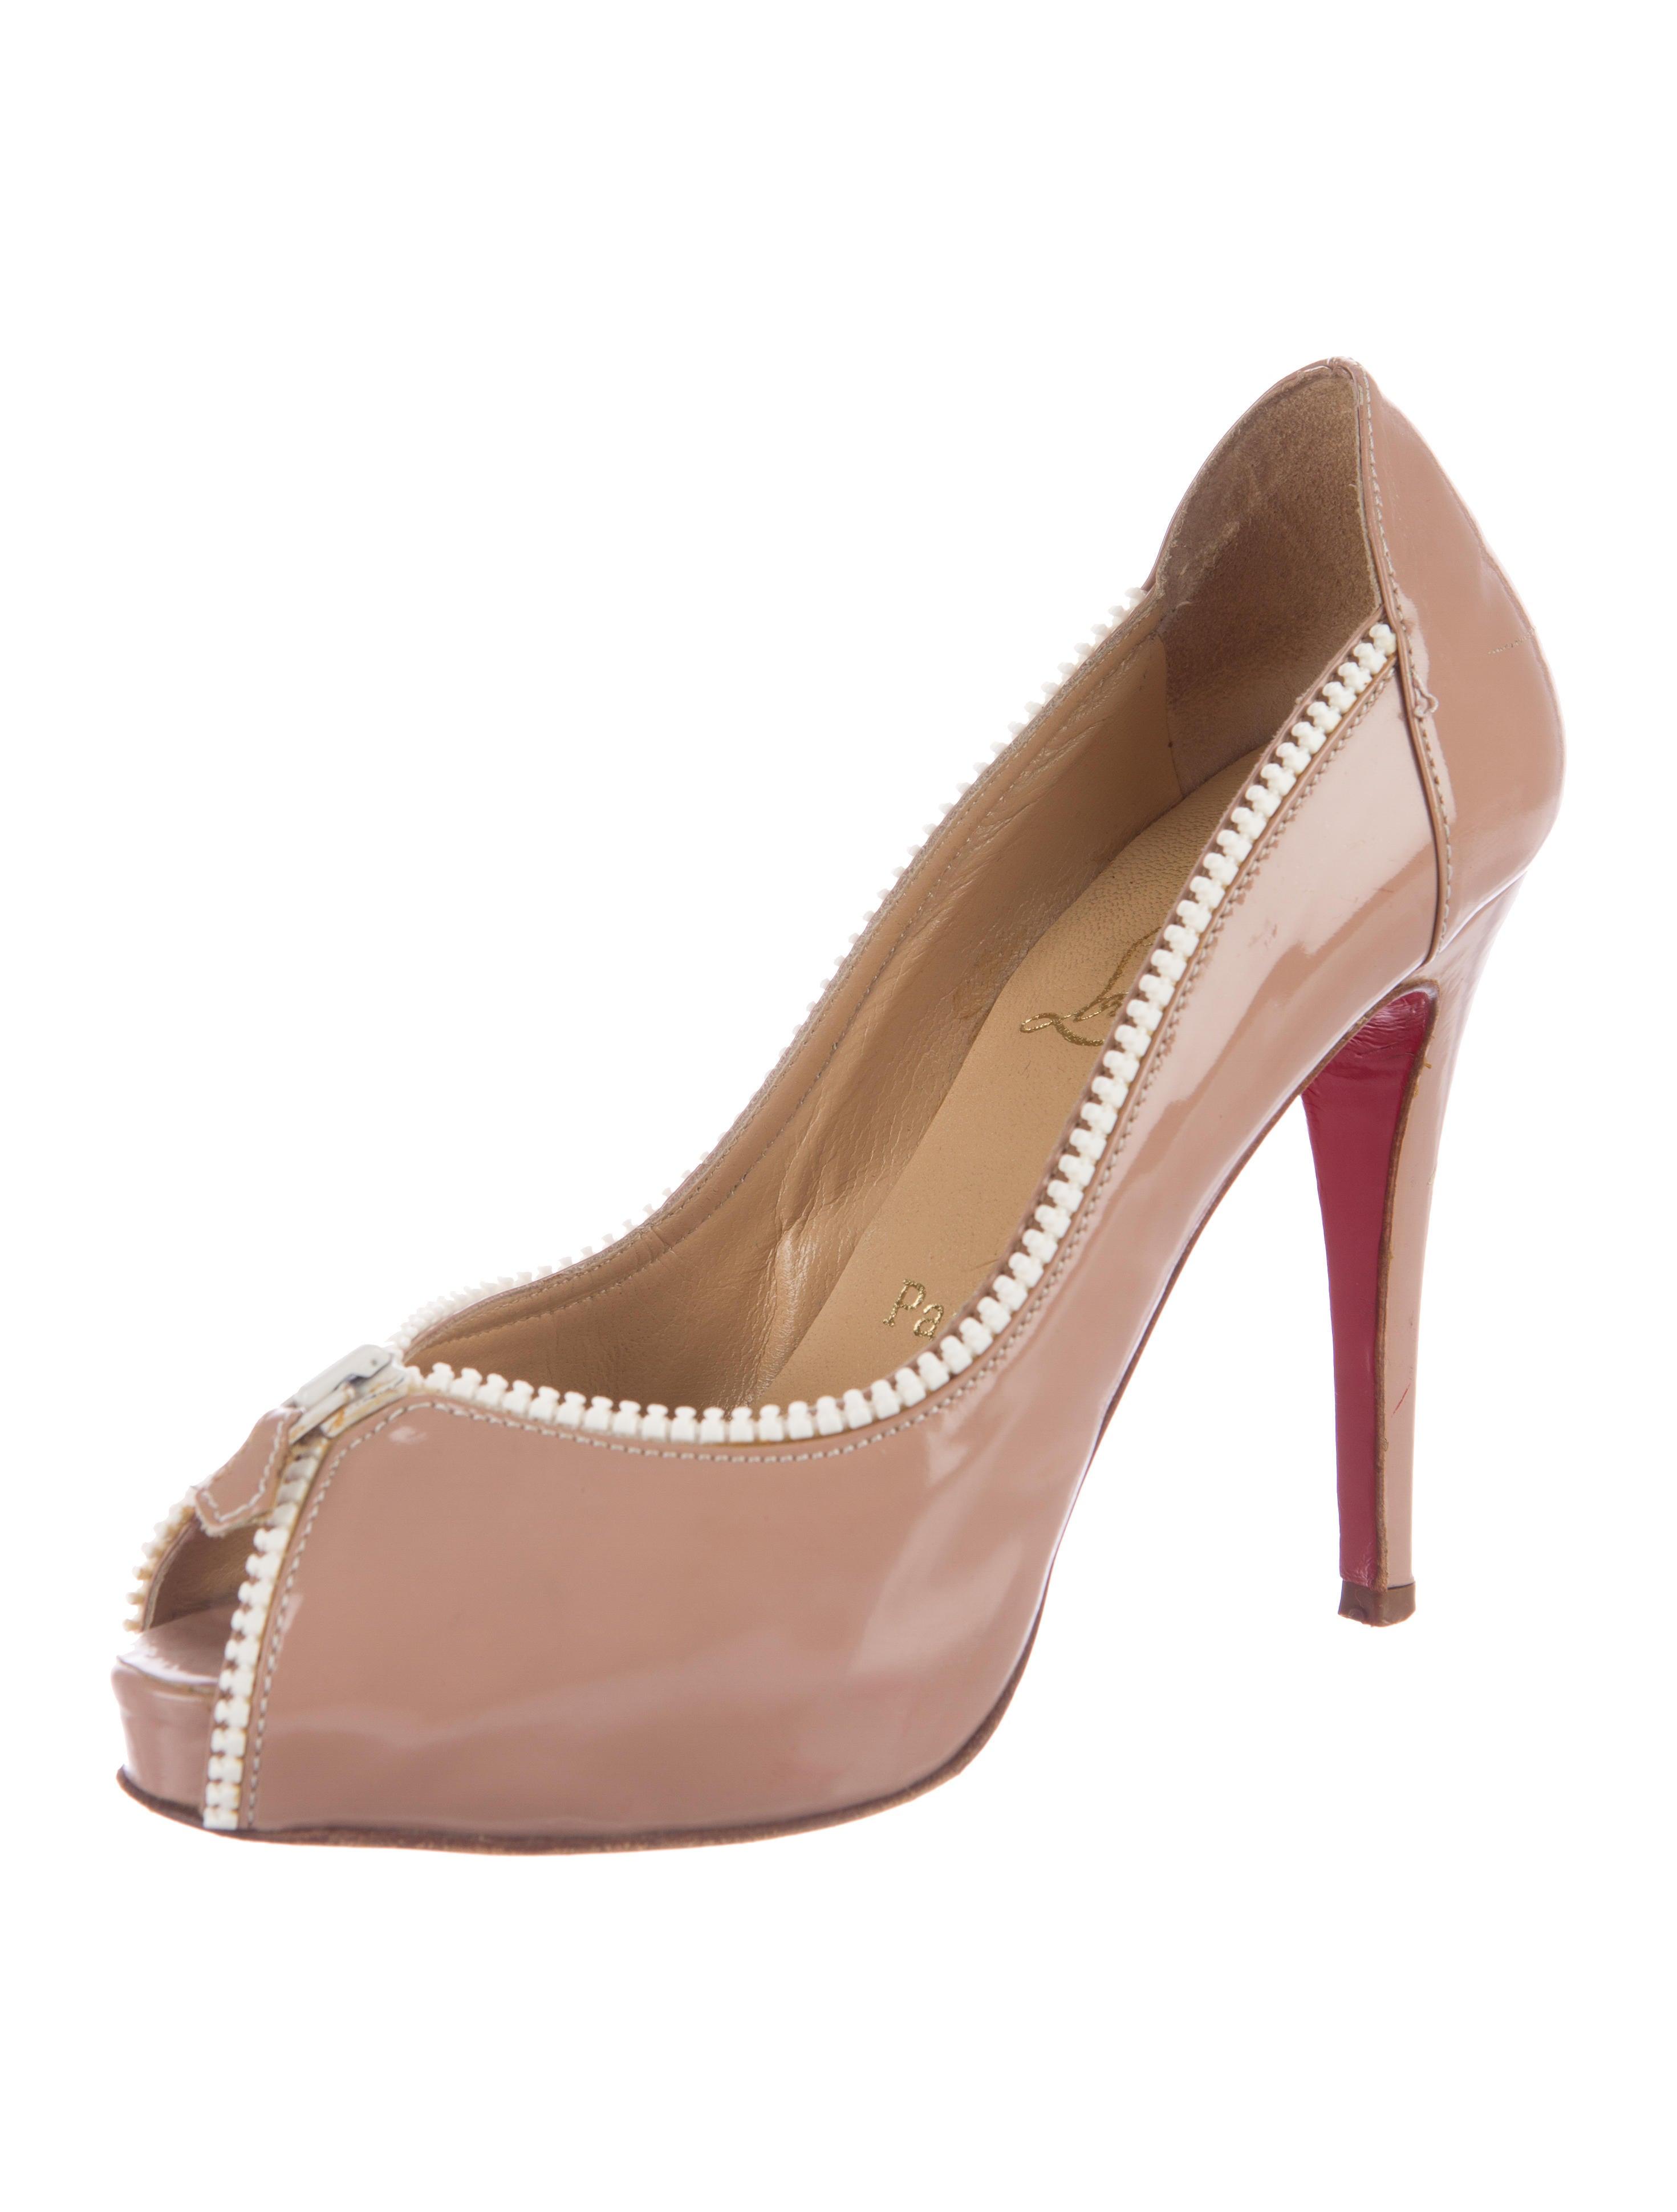 a76b24245 christian louboutin zoulou leather platform sandals jumia shoes nigeria